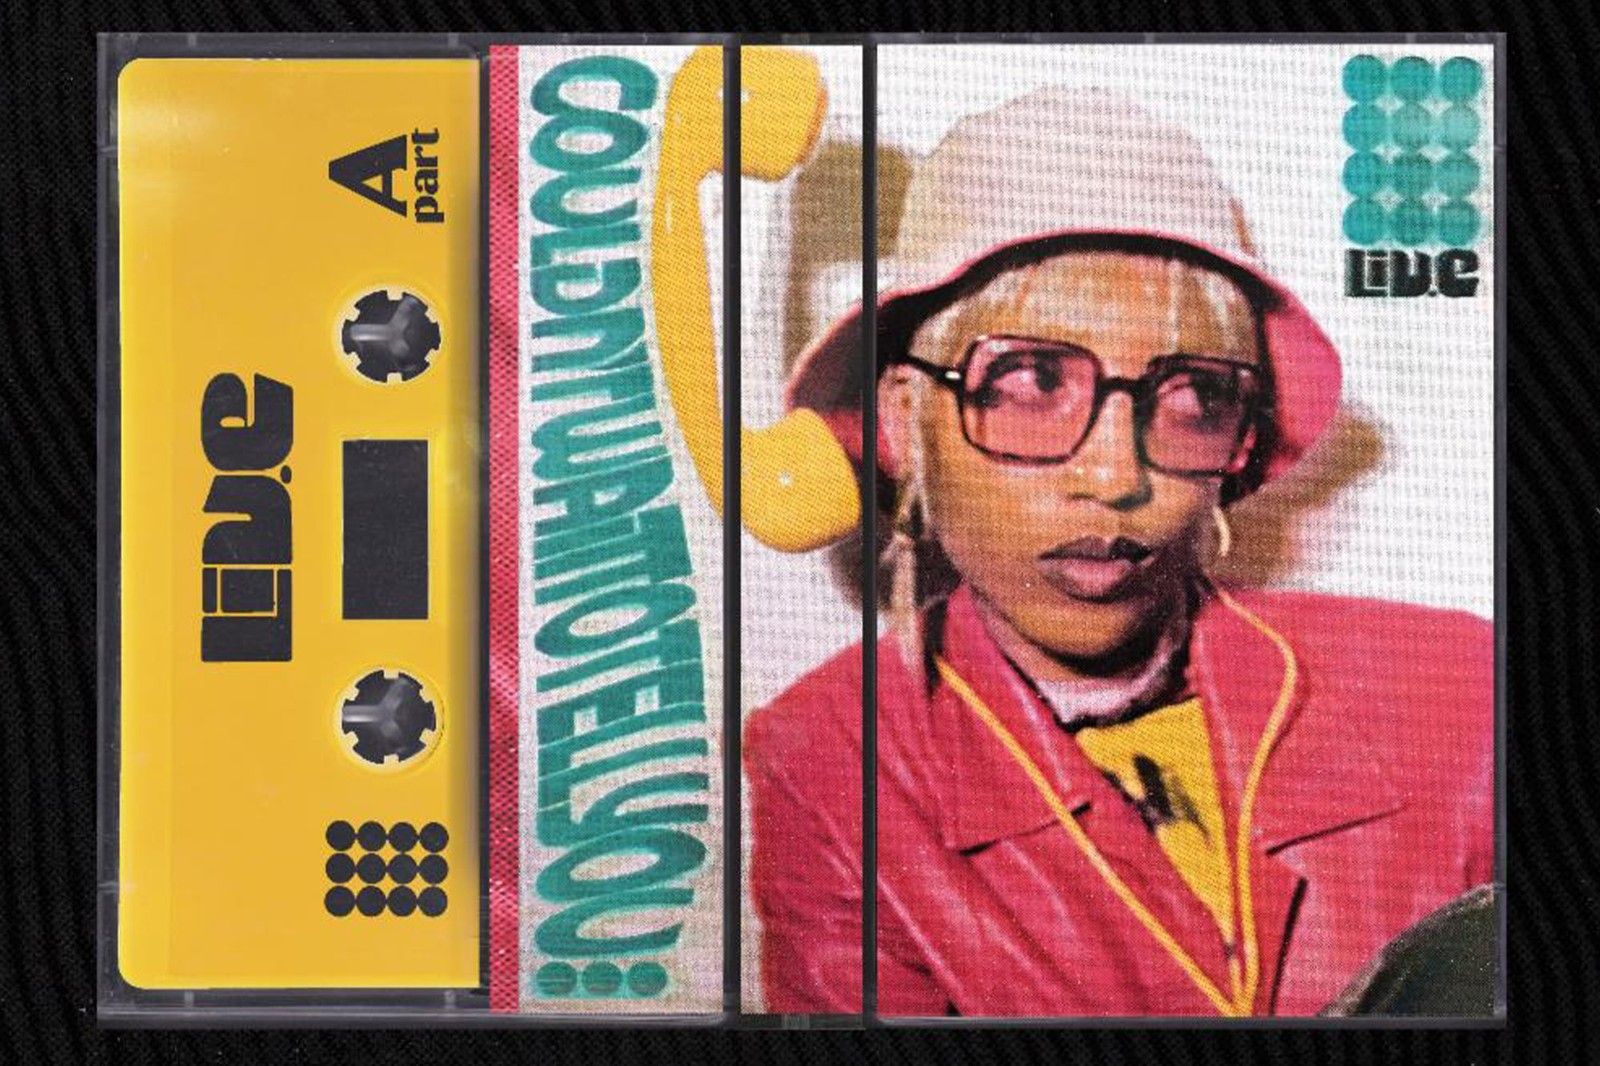 Liv.e Interview Couldn't Wait to Tell You New Album Singer Songwriter Erykah Badu Earl Sweatshirt MIKE Black Noise BbyMutha Dallas Los Angeles HYPEBEAST Best New Tracks